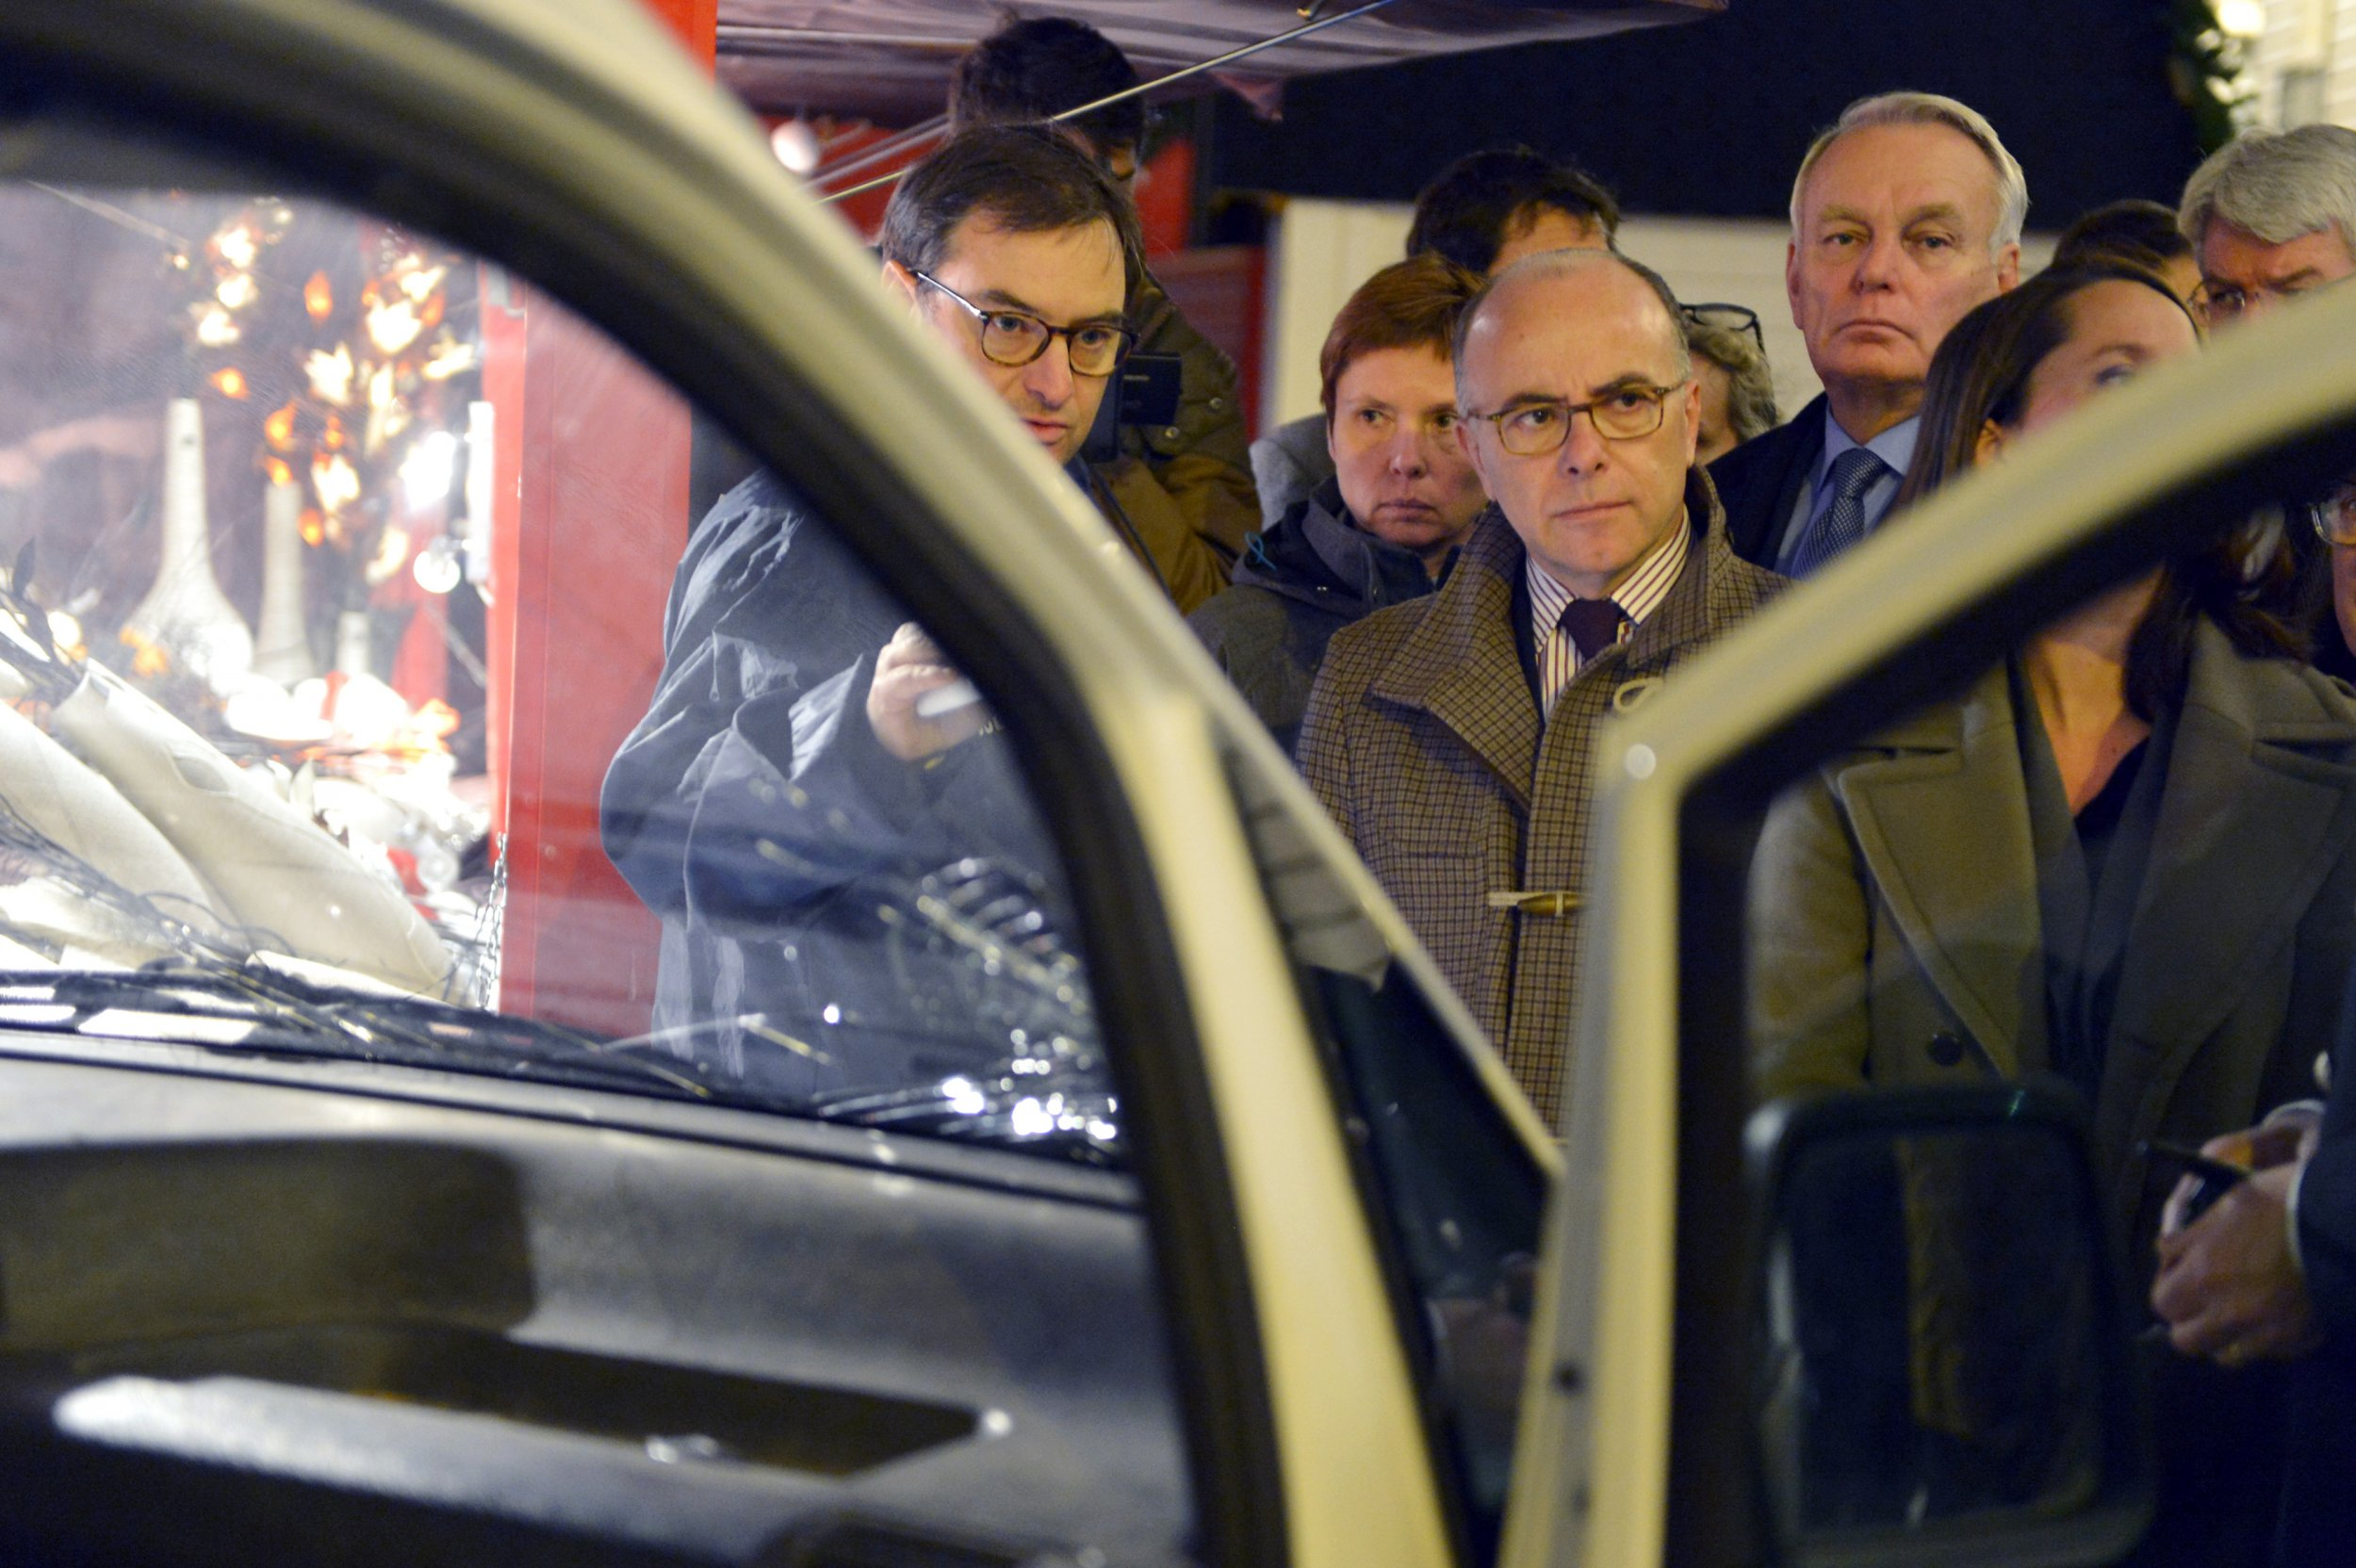 Van attack in France